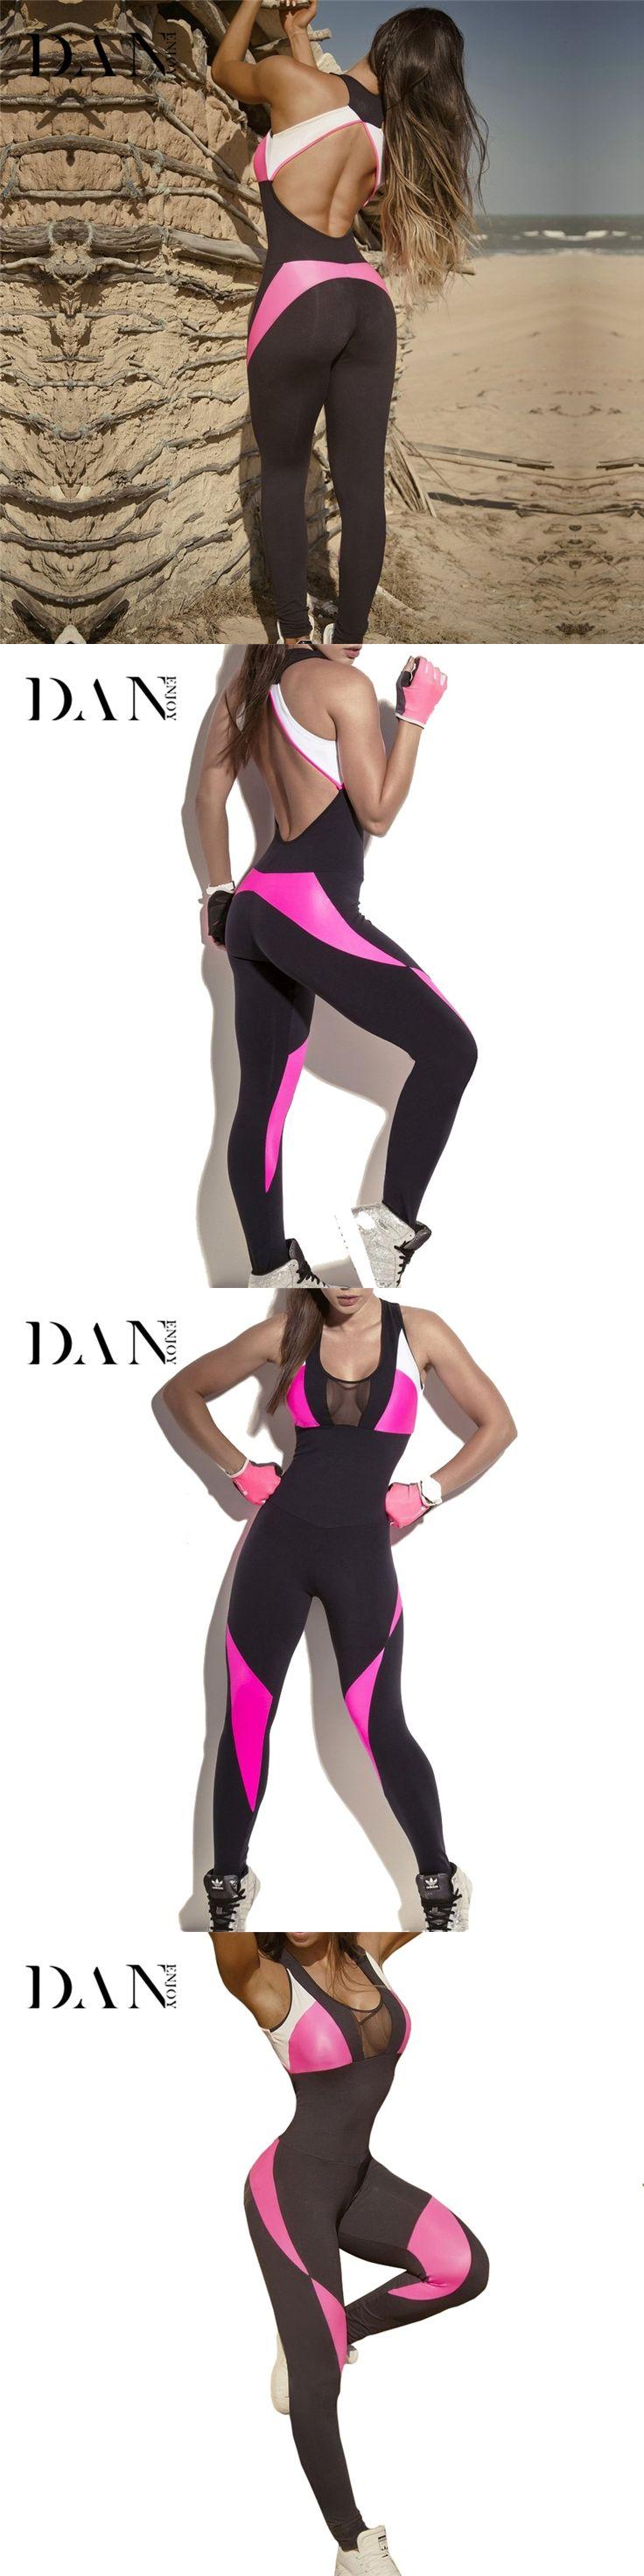 DANENJOY Women Sports Jumpsuit Fitness Yoga Leggings Coverall Sexy Training Jogging Compression Gym Sports Romper Yoga Pants